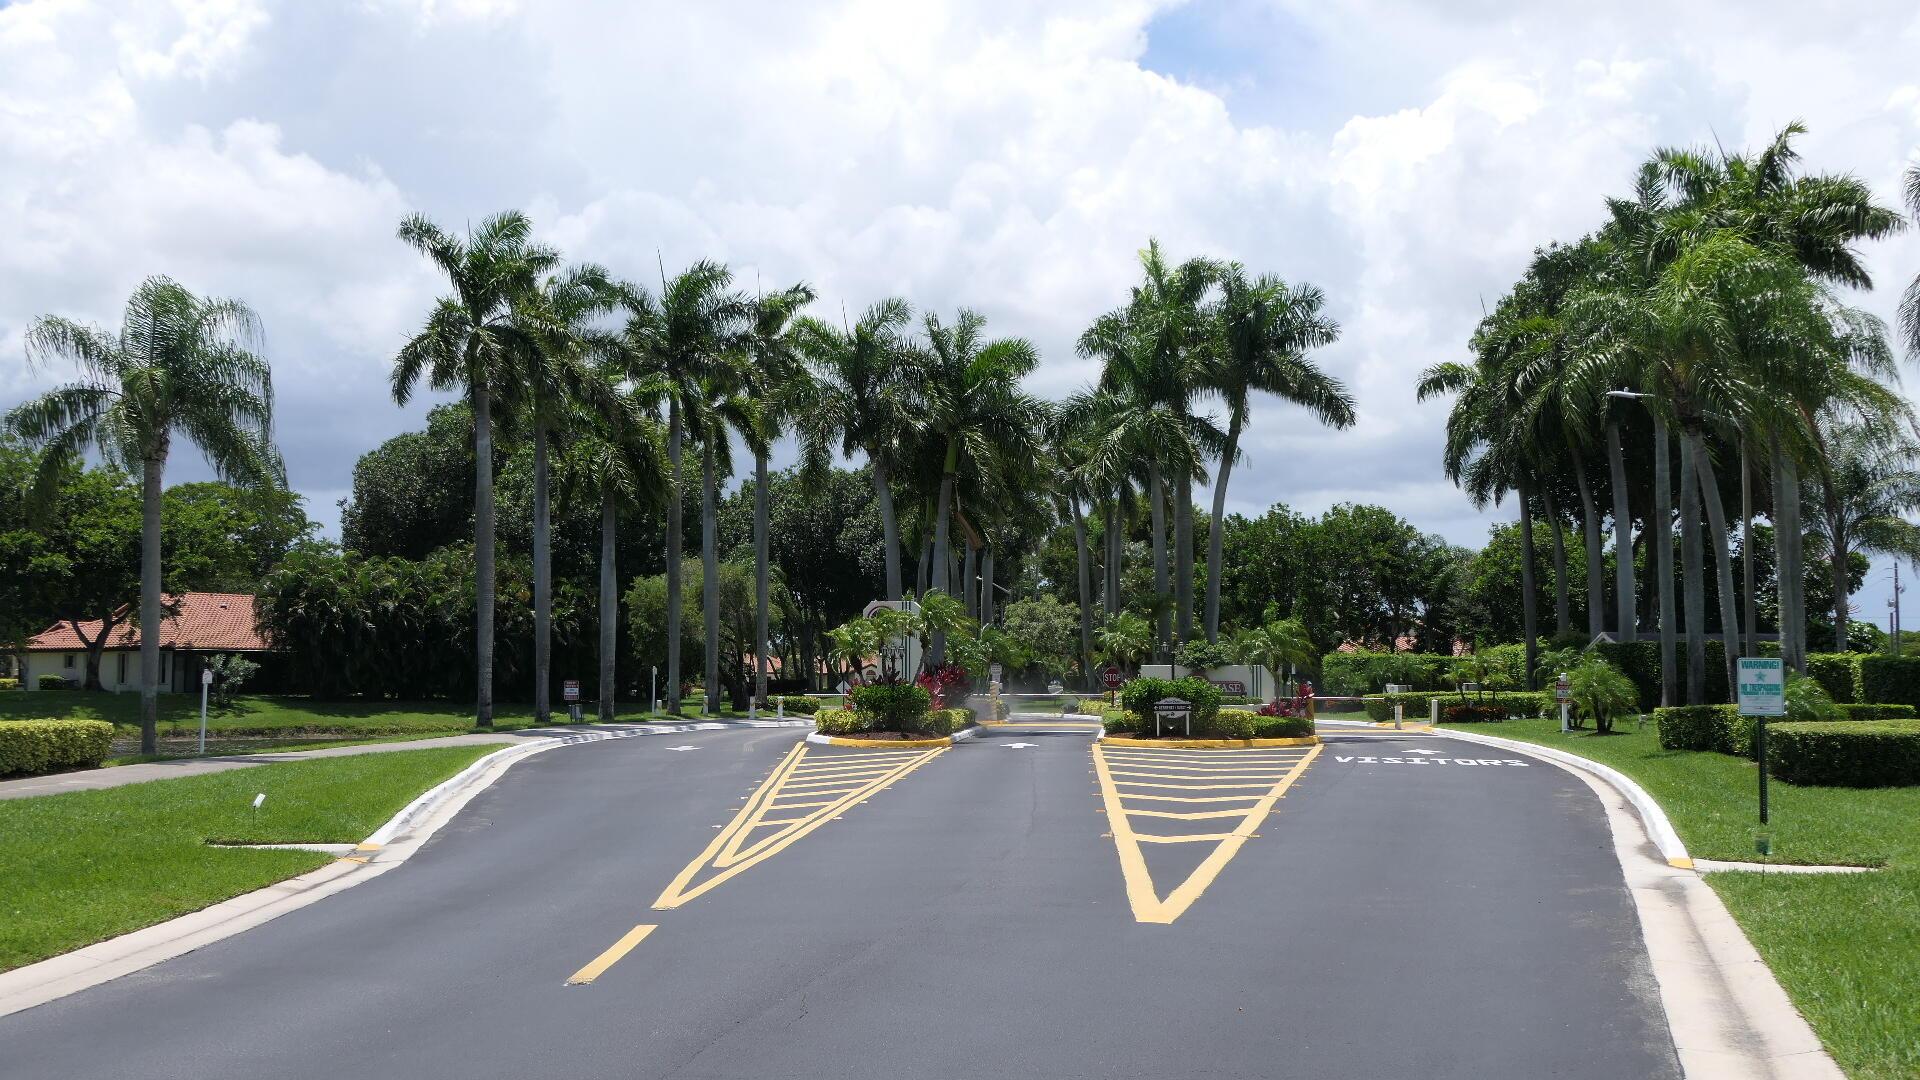 10804 Bahama Palm Way 101 Boynton Beach, FL 33437 photo 51